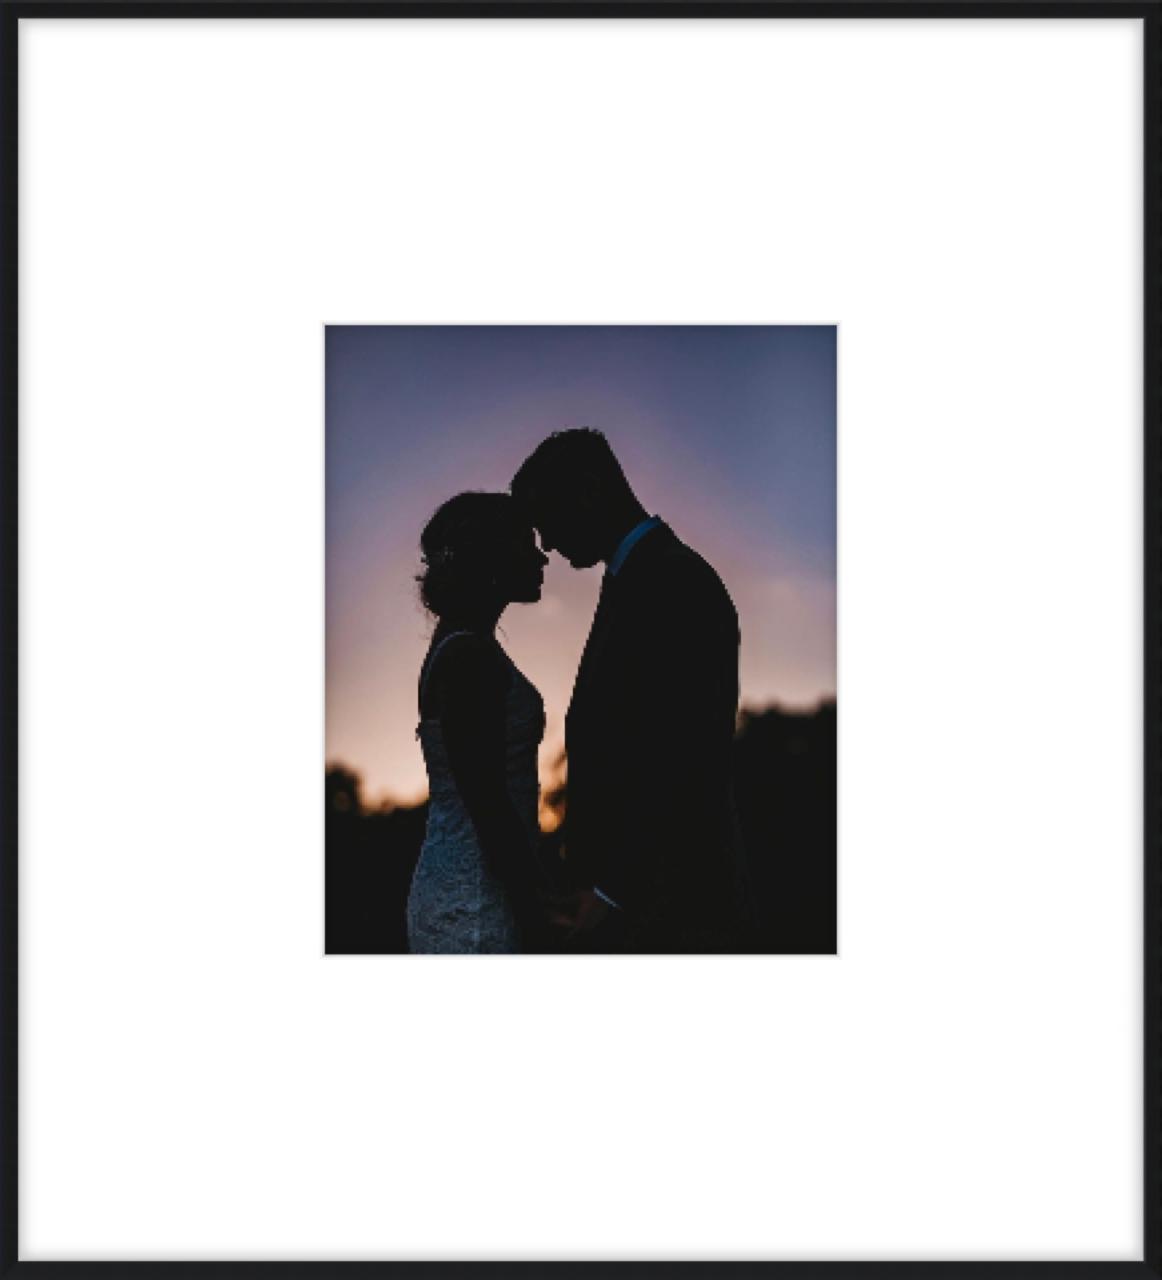 Wedding photo with large mat